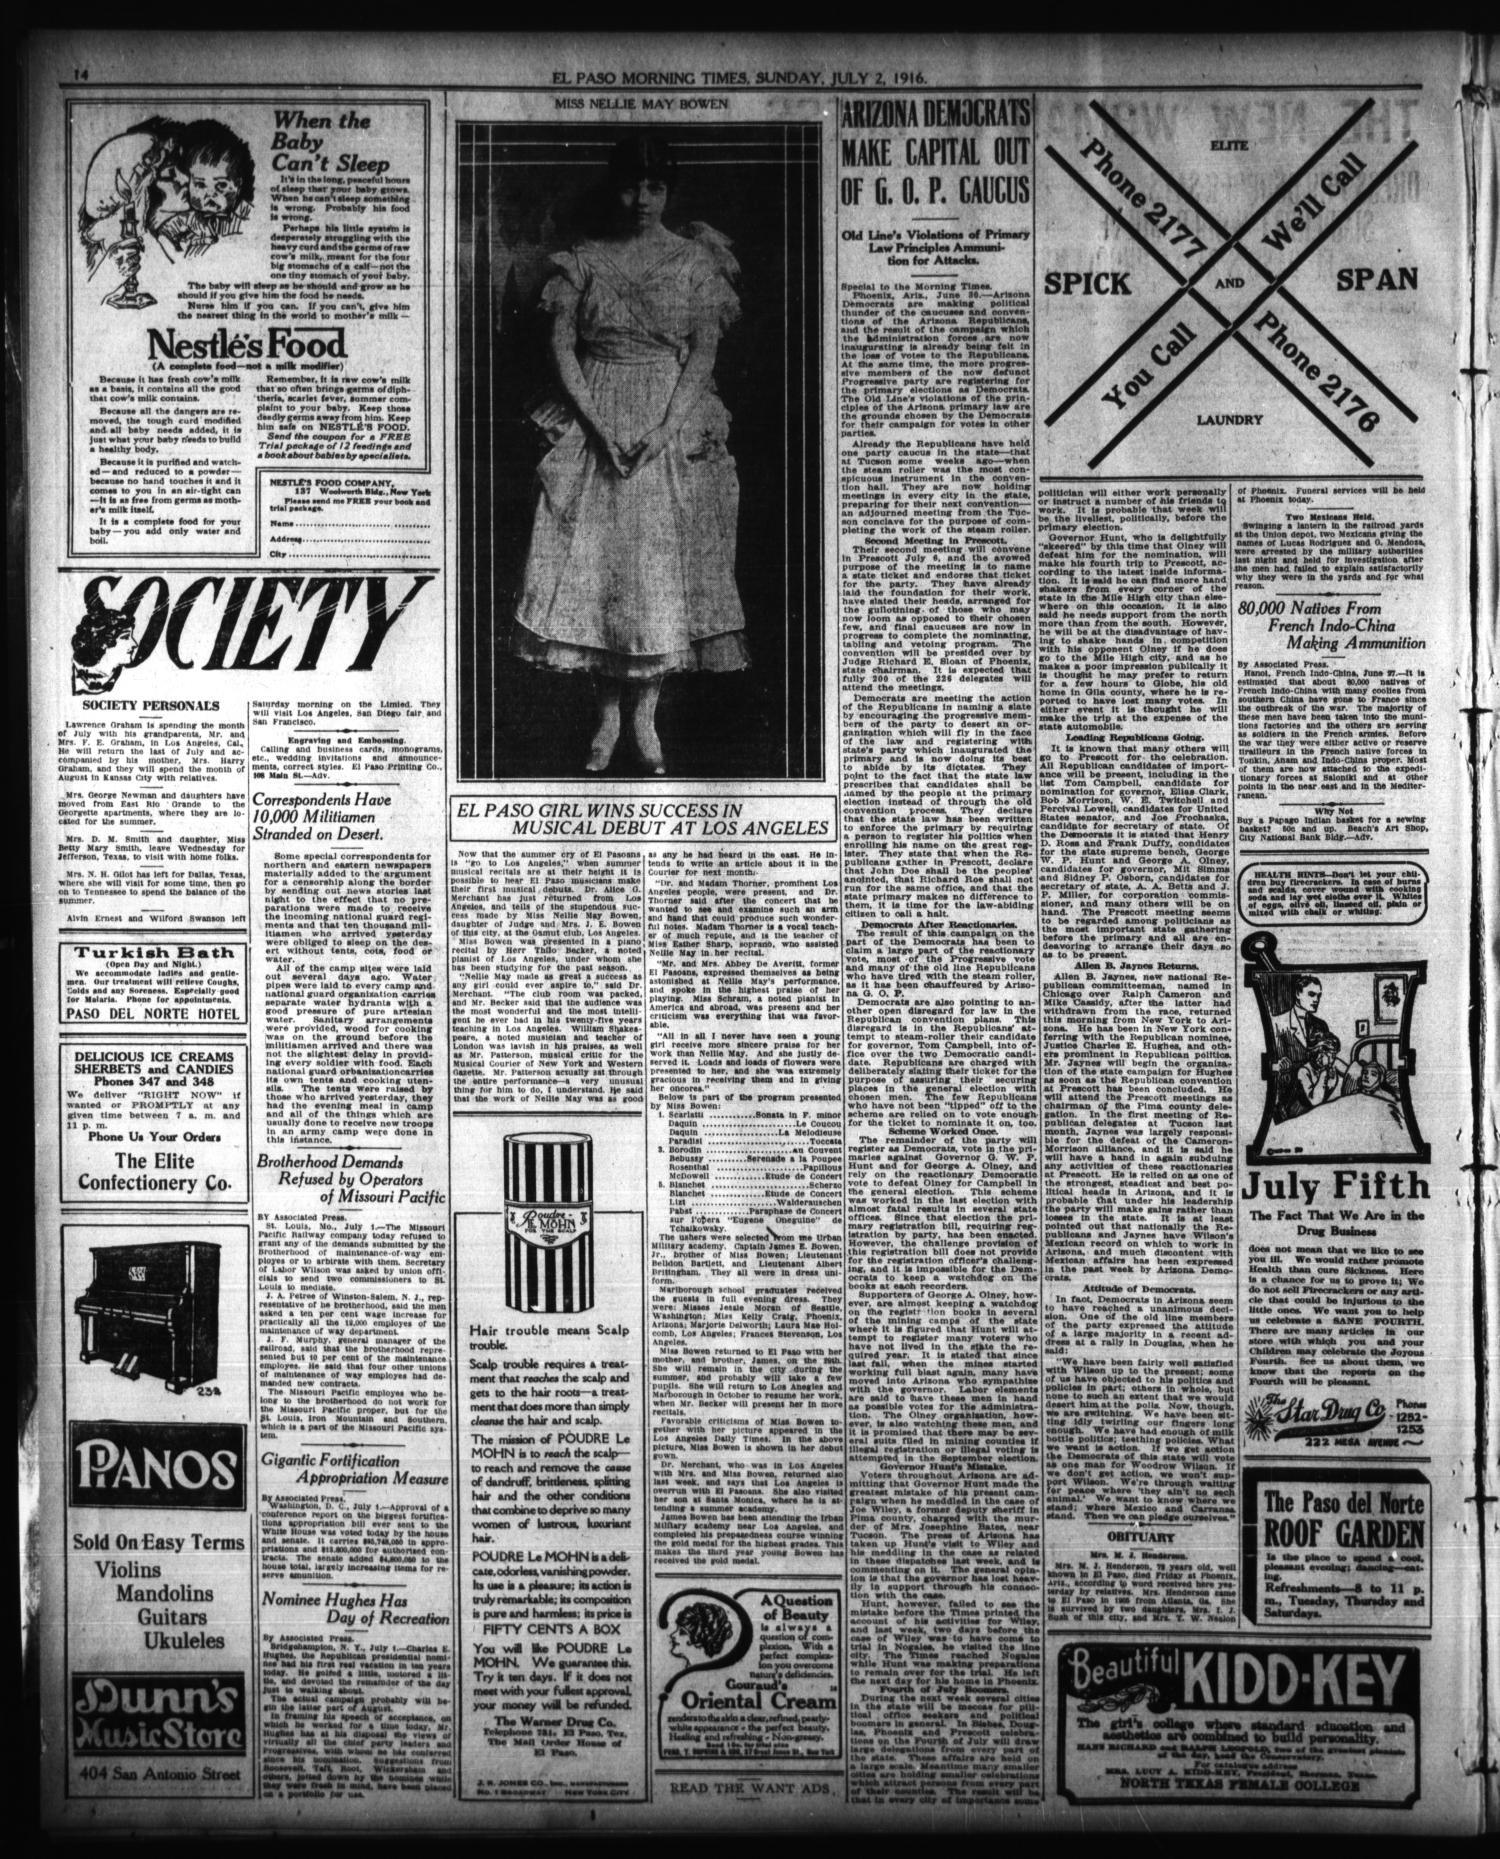 El Paso Morning Times El Paso Tex Vol 36th Year Ed 1 Sunday July 2 1916 Page 14 Of 42 The Portal To Texas History